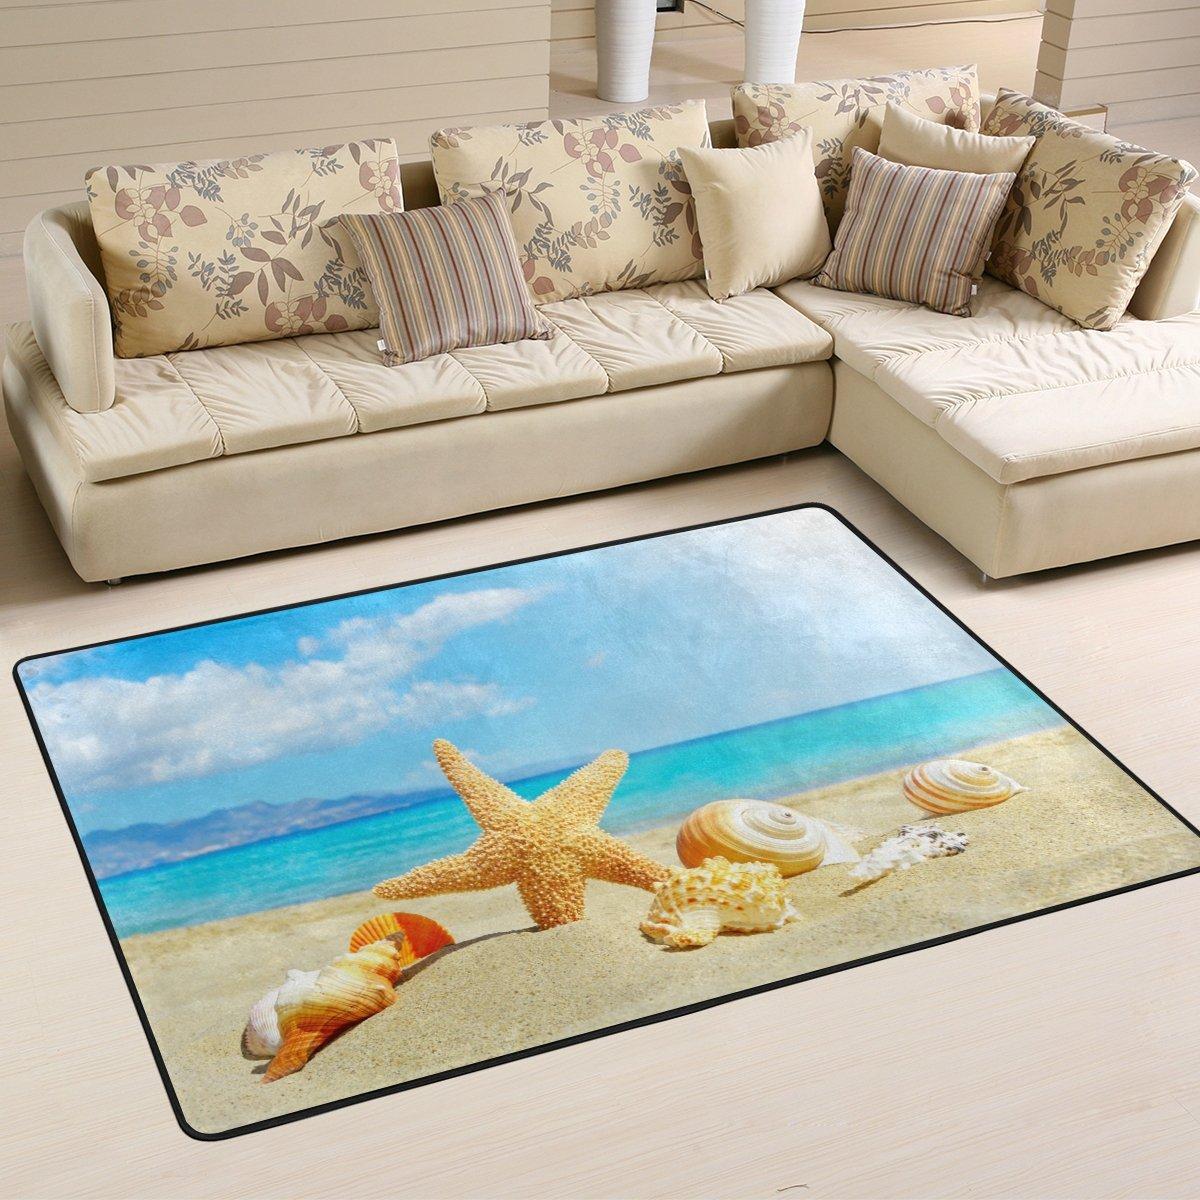 Amazon.com: Bright Summer Holiday Sandy Beach with Starfish ...